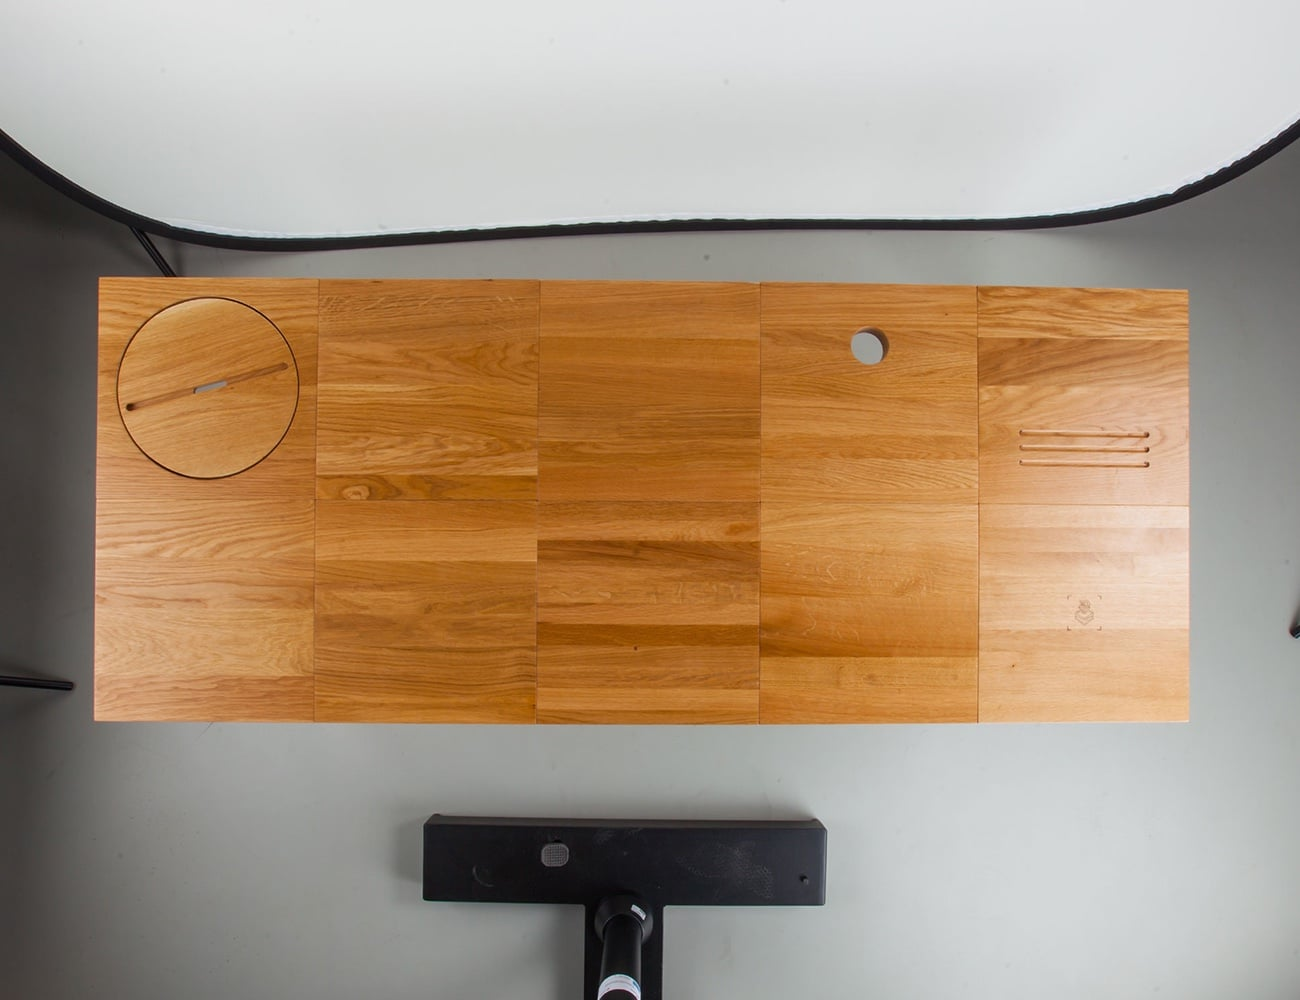 Modulos Adjustable Modular Desk